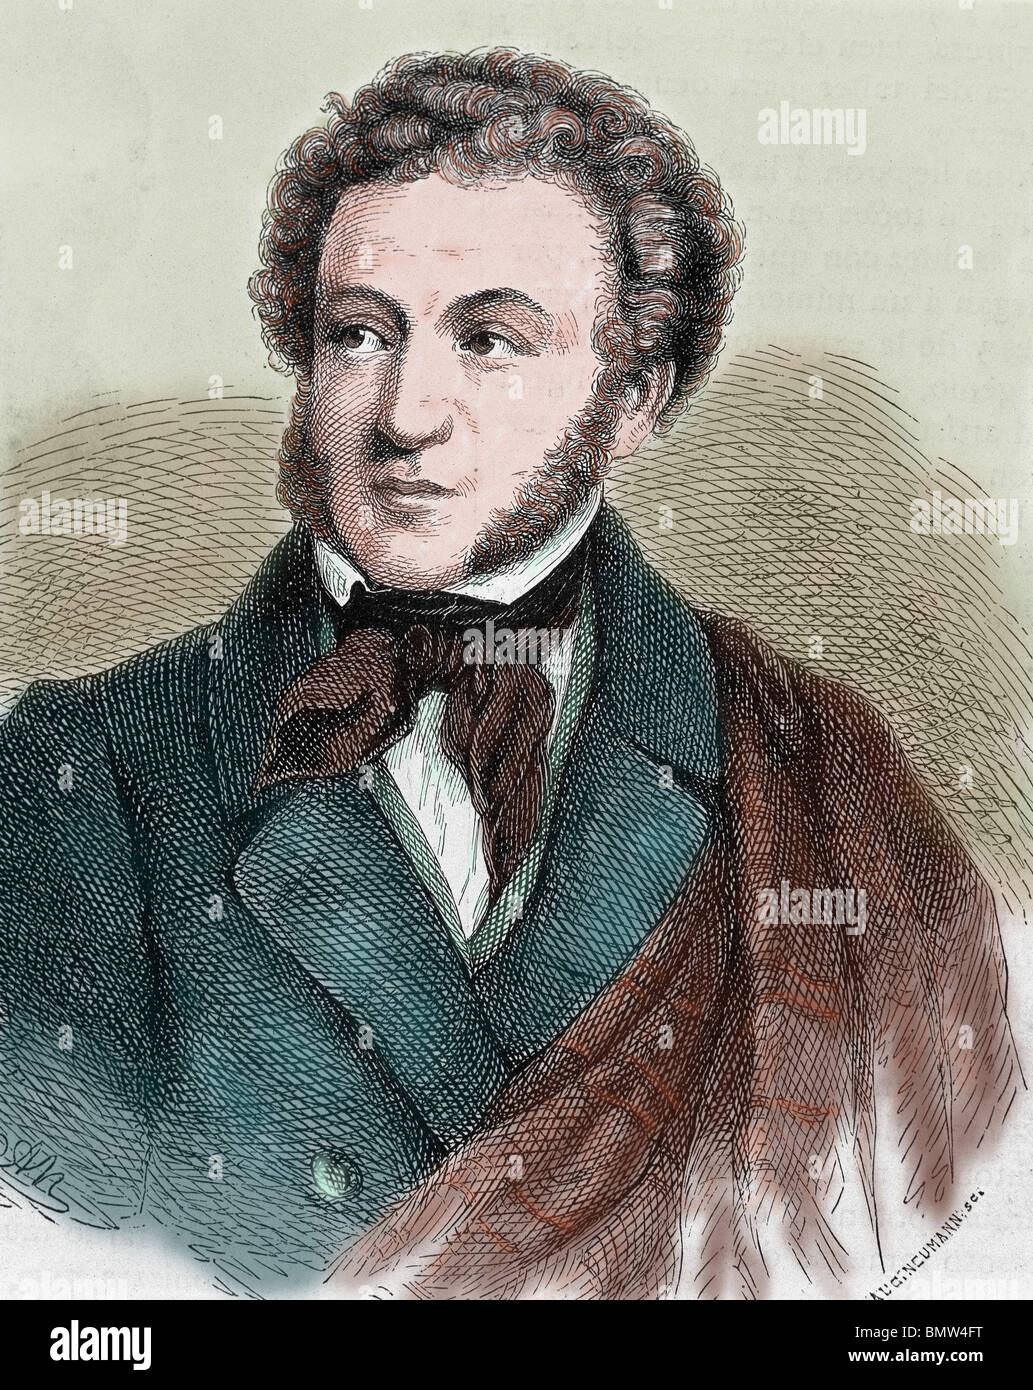 Pushkin, Aleksandr Sergeevic (Moscow ,1799-Petersburg, 1837). Russian poet. Colored engraving. - Stock Image